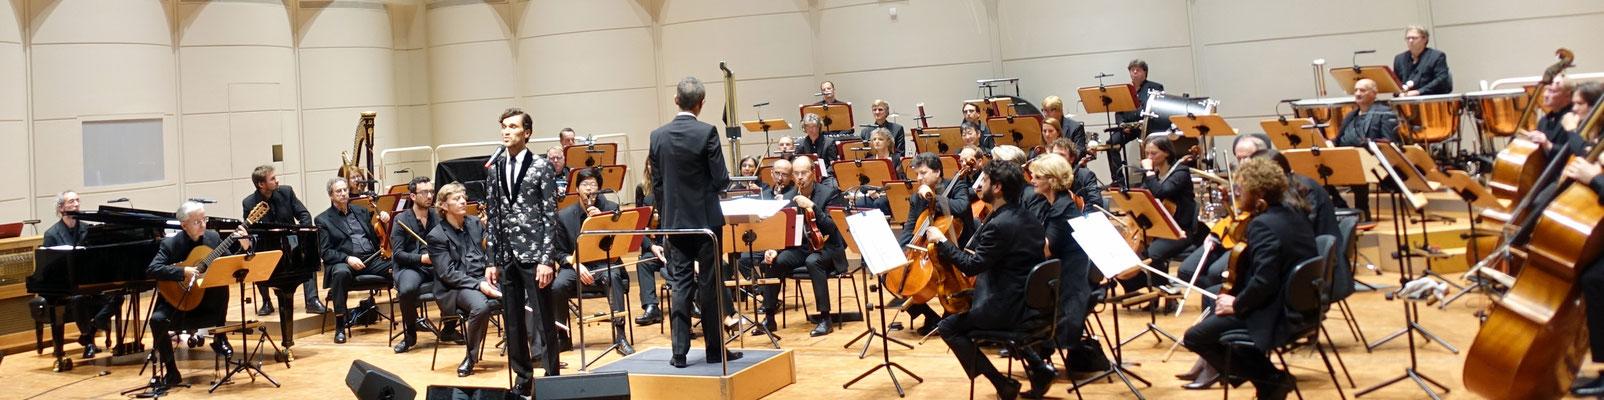 VLADIMIR KORNEEV, voc, LIVIU PETCU, Ltg., WDR Funkhausorchester (Konzerthaus Dortmund, 2017)